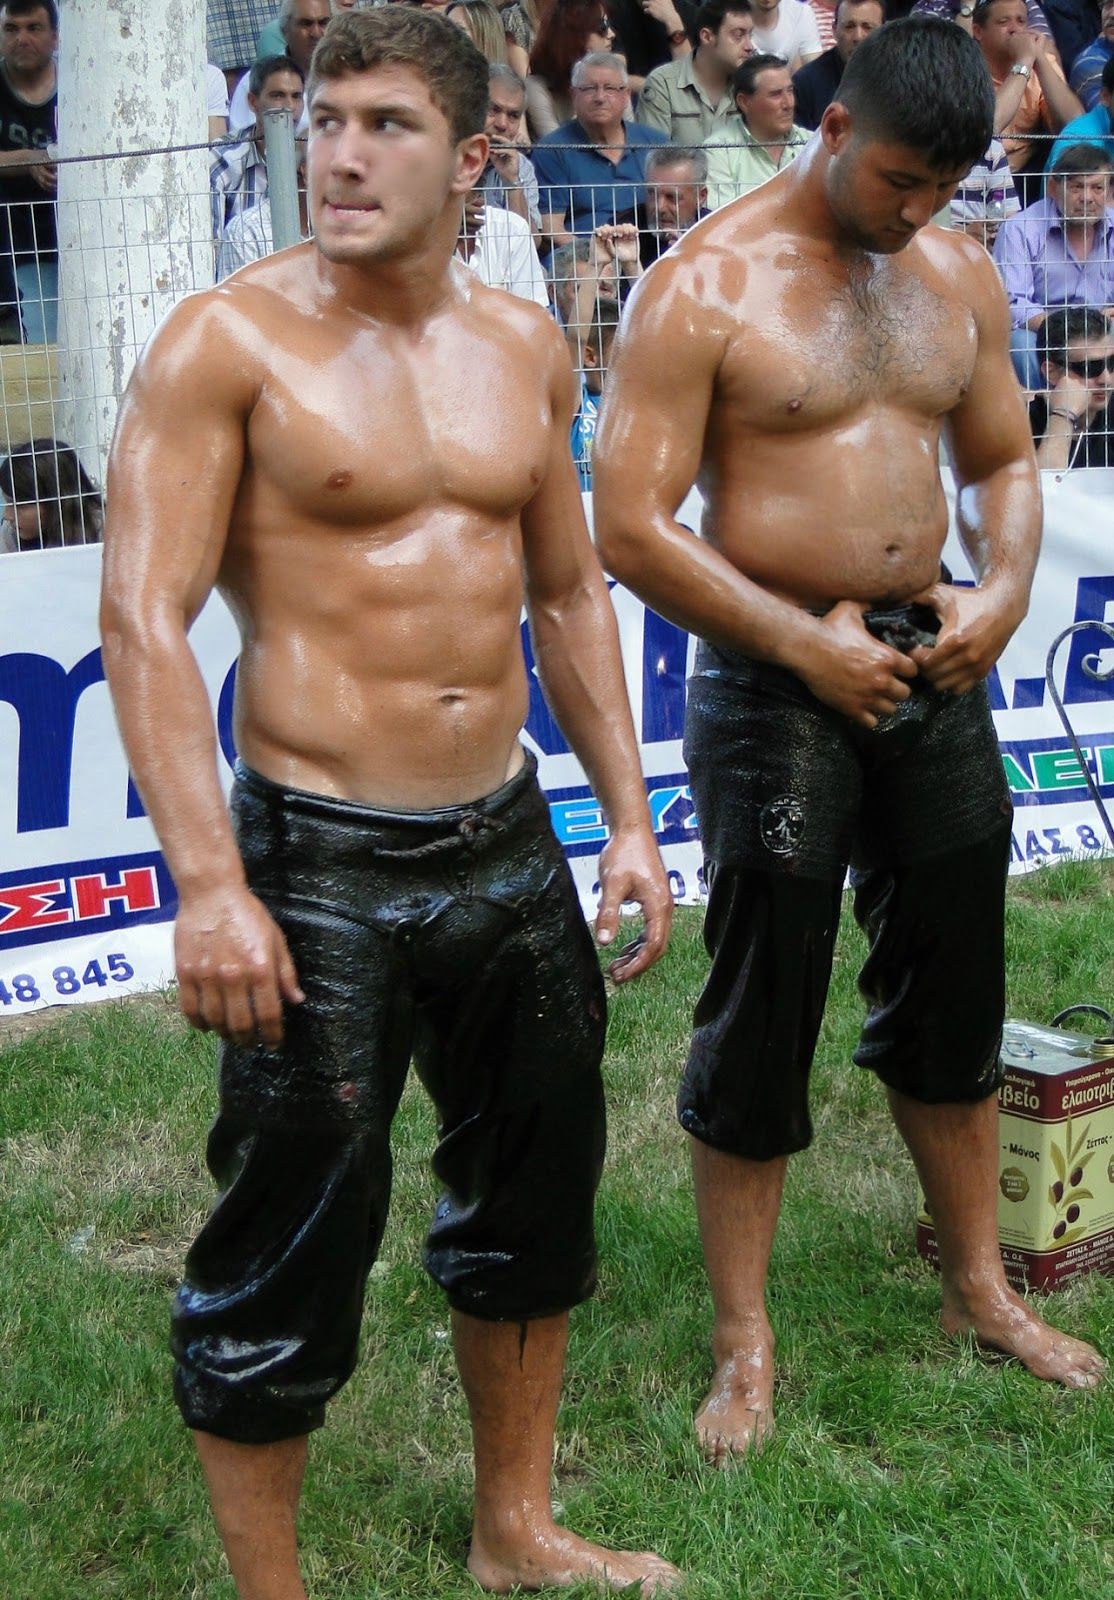 Hot Guys Nude: Turkish Oil Wrestlers | Hot Turkish Men